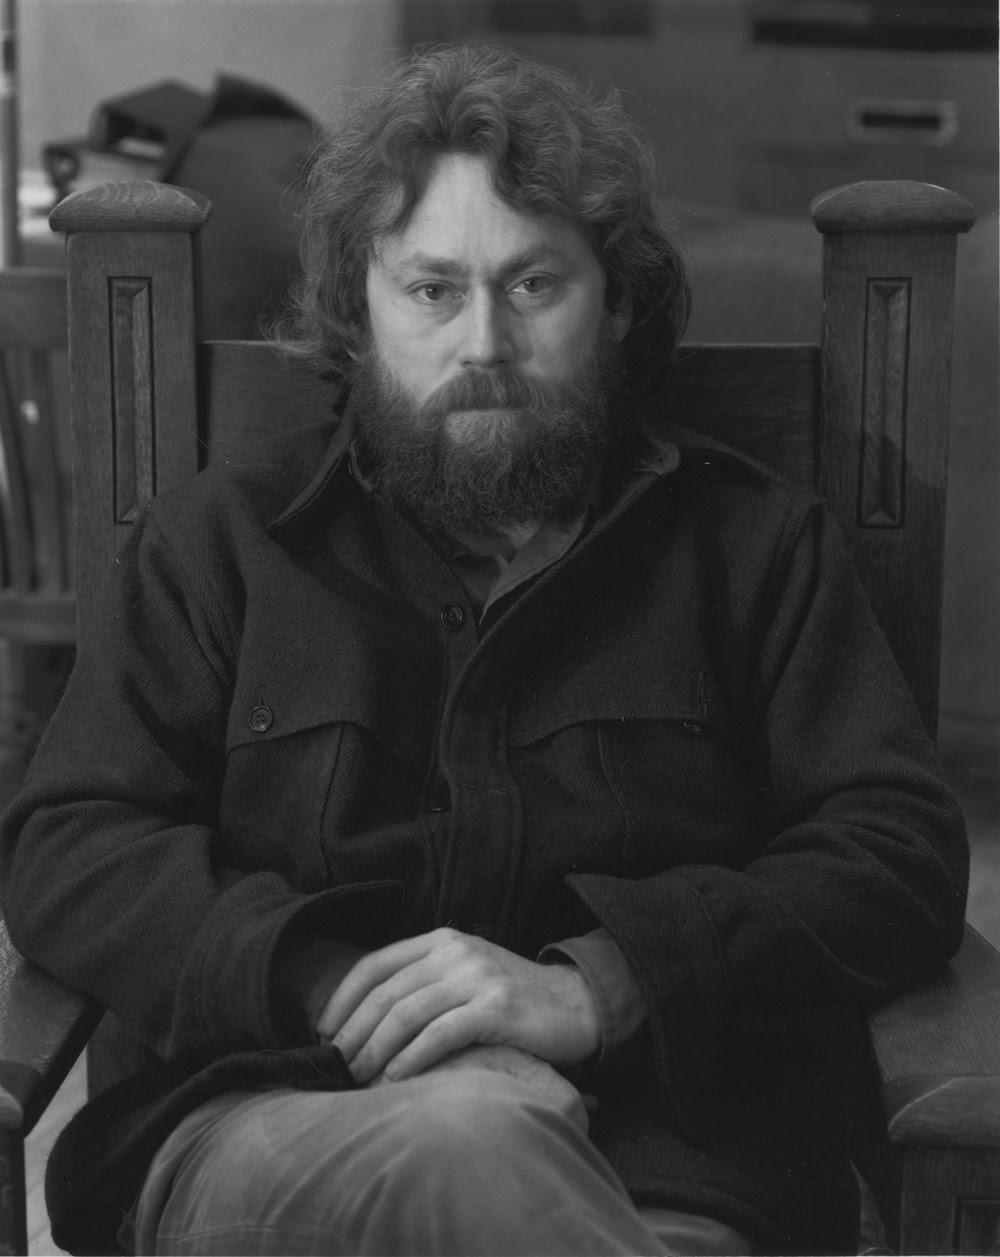 Donald Judd, 1970 | © Courtesy of Paul Katz